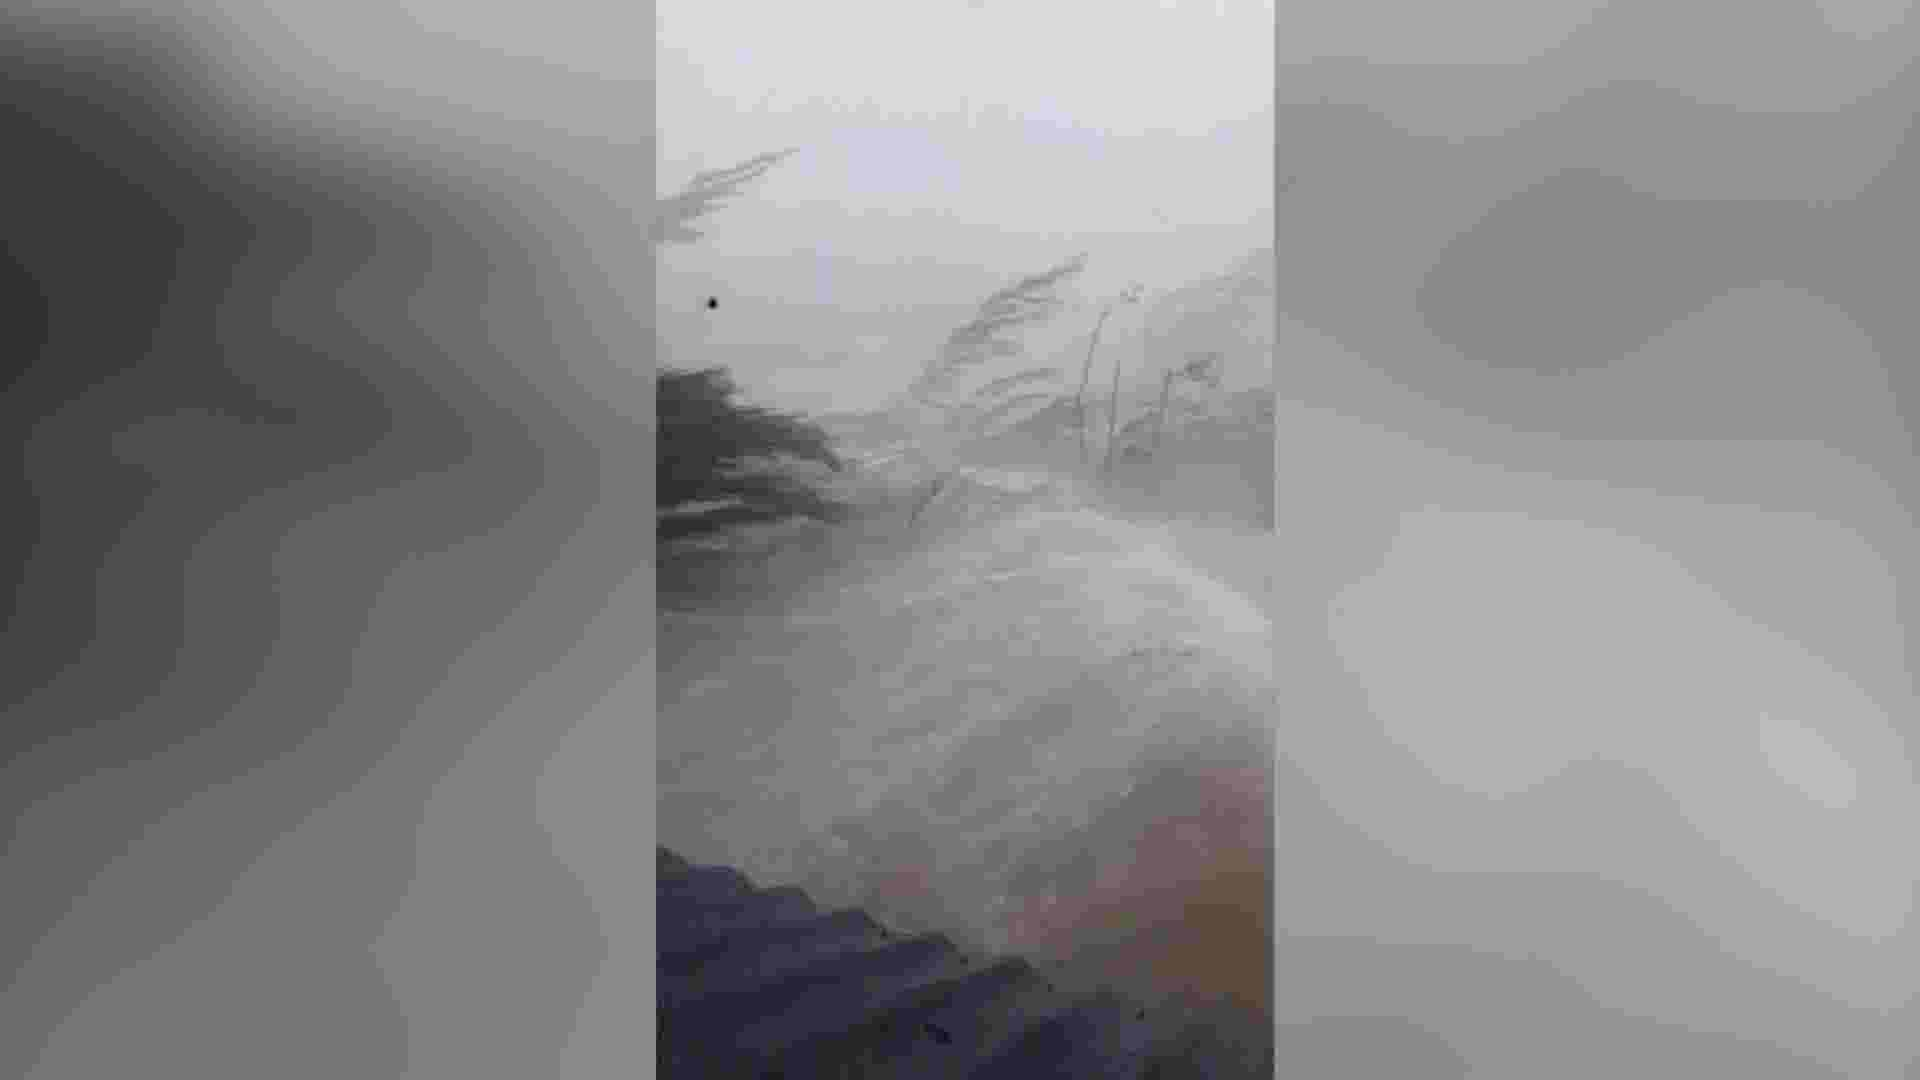 Aerial Hurricane Dorian video, photos show Bahamas damage